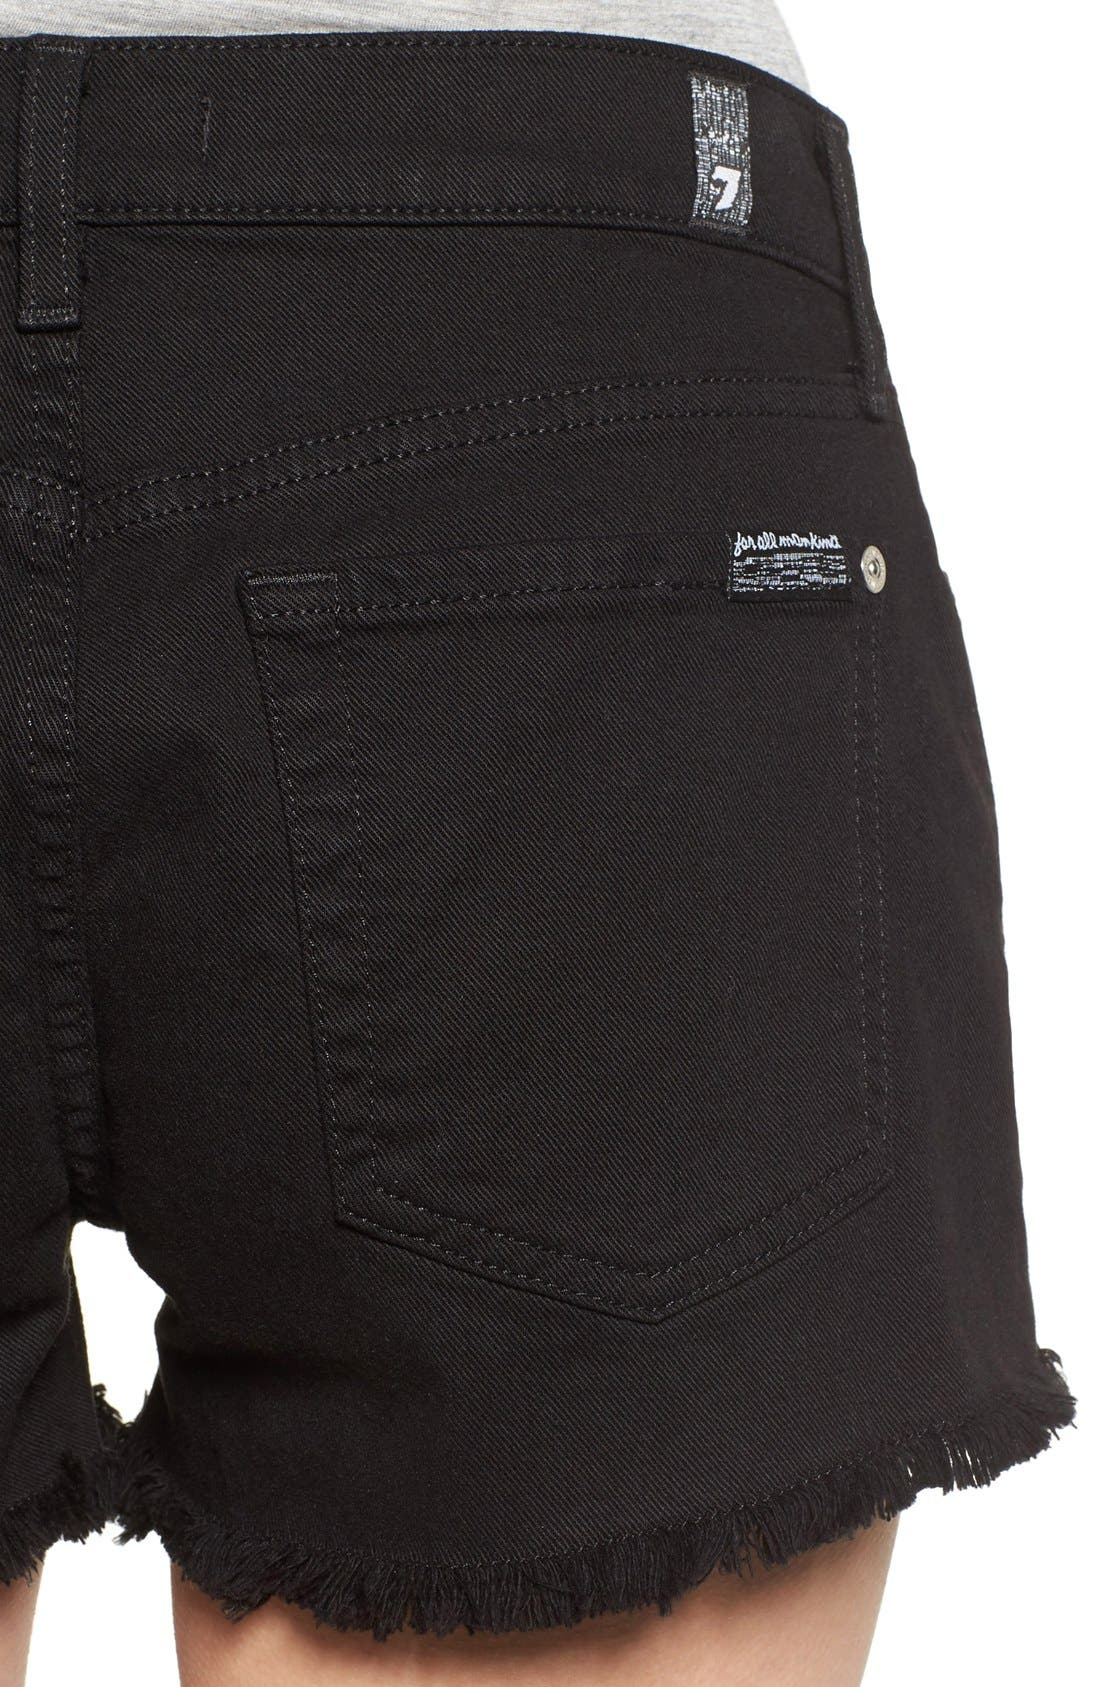 Cutoff Shorts,                             Alternate thumbnail 4, color,                             Black